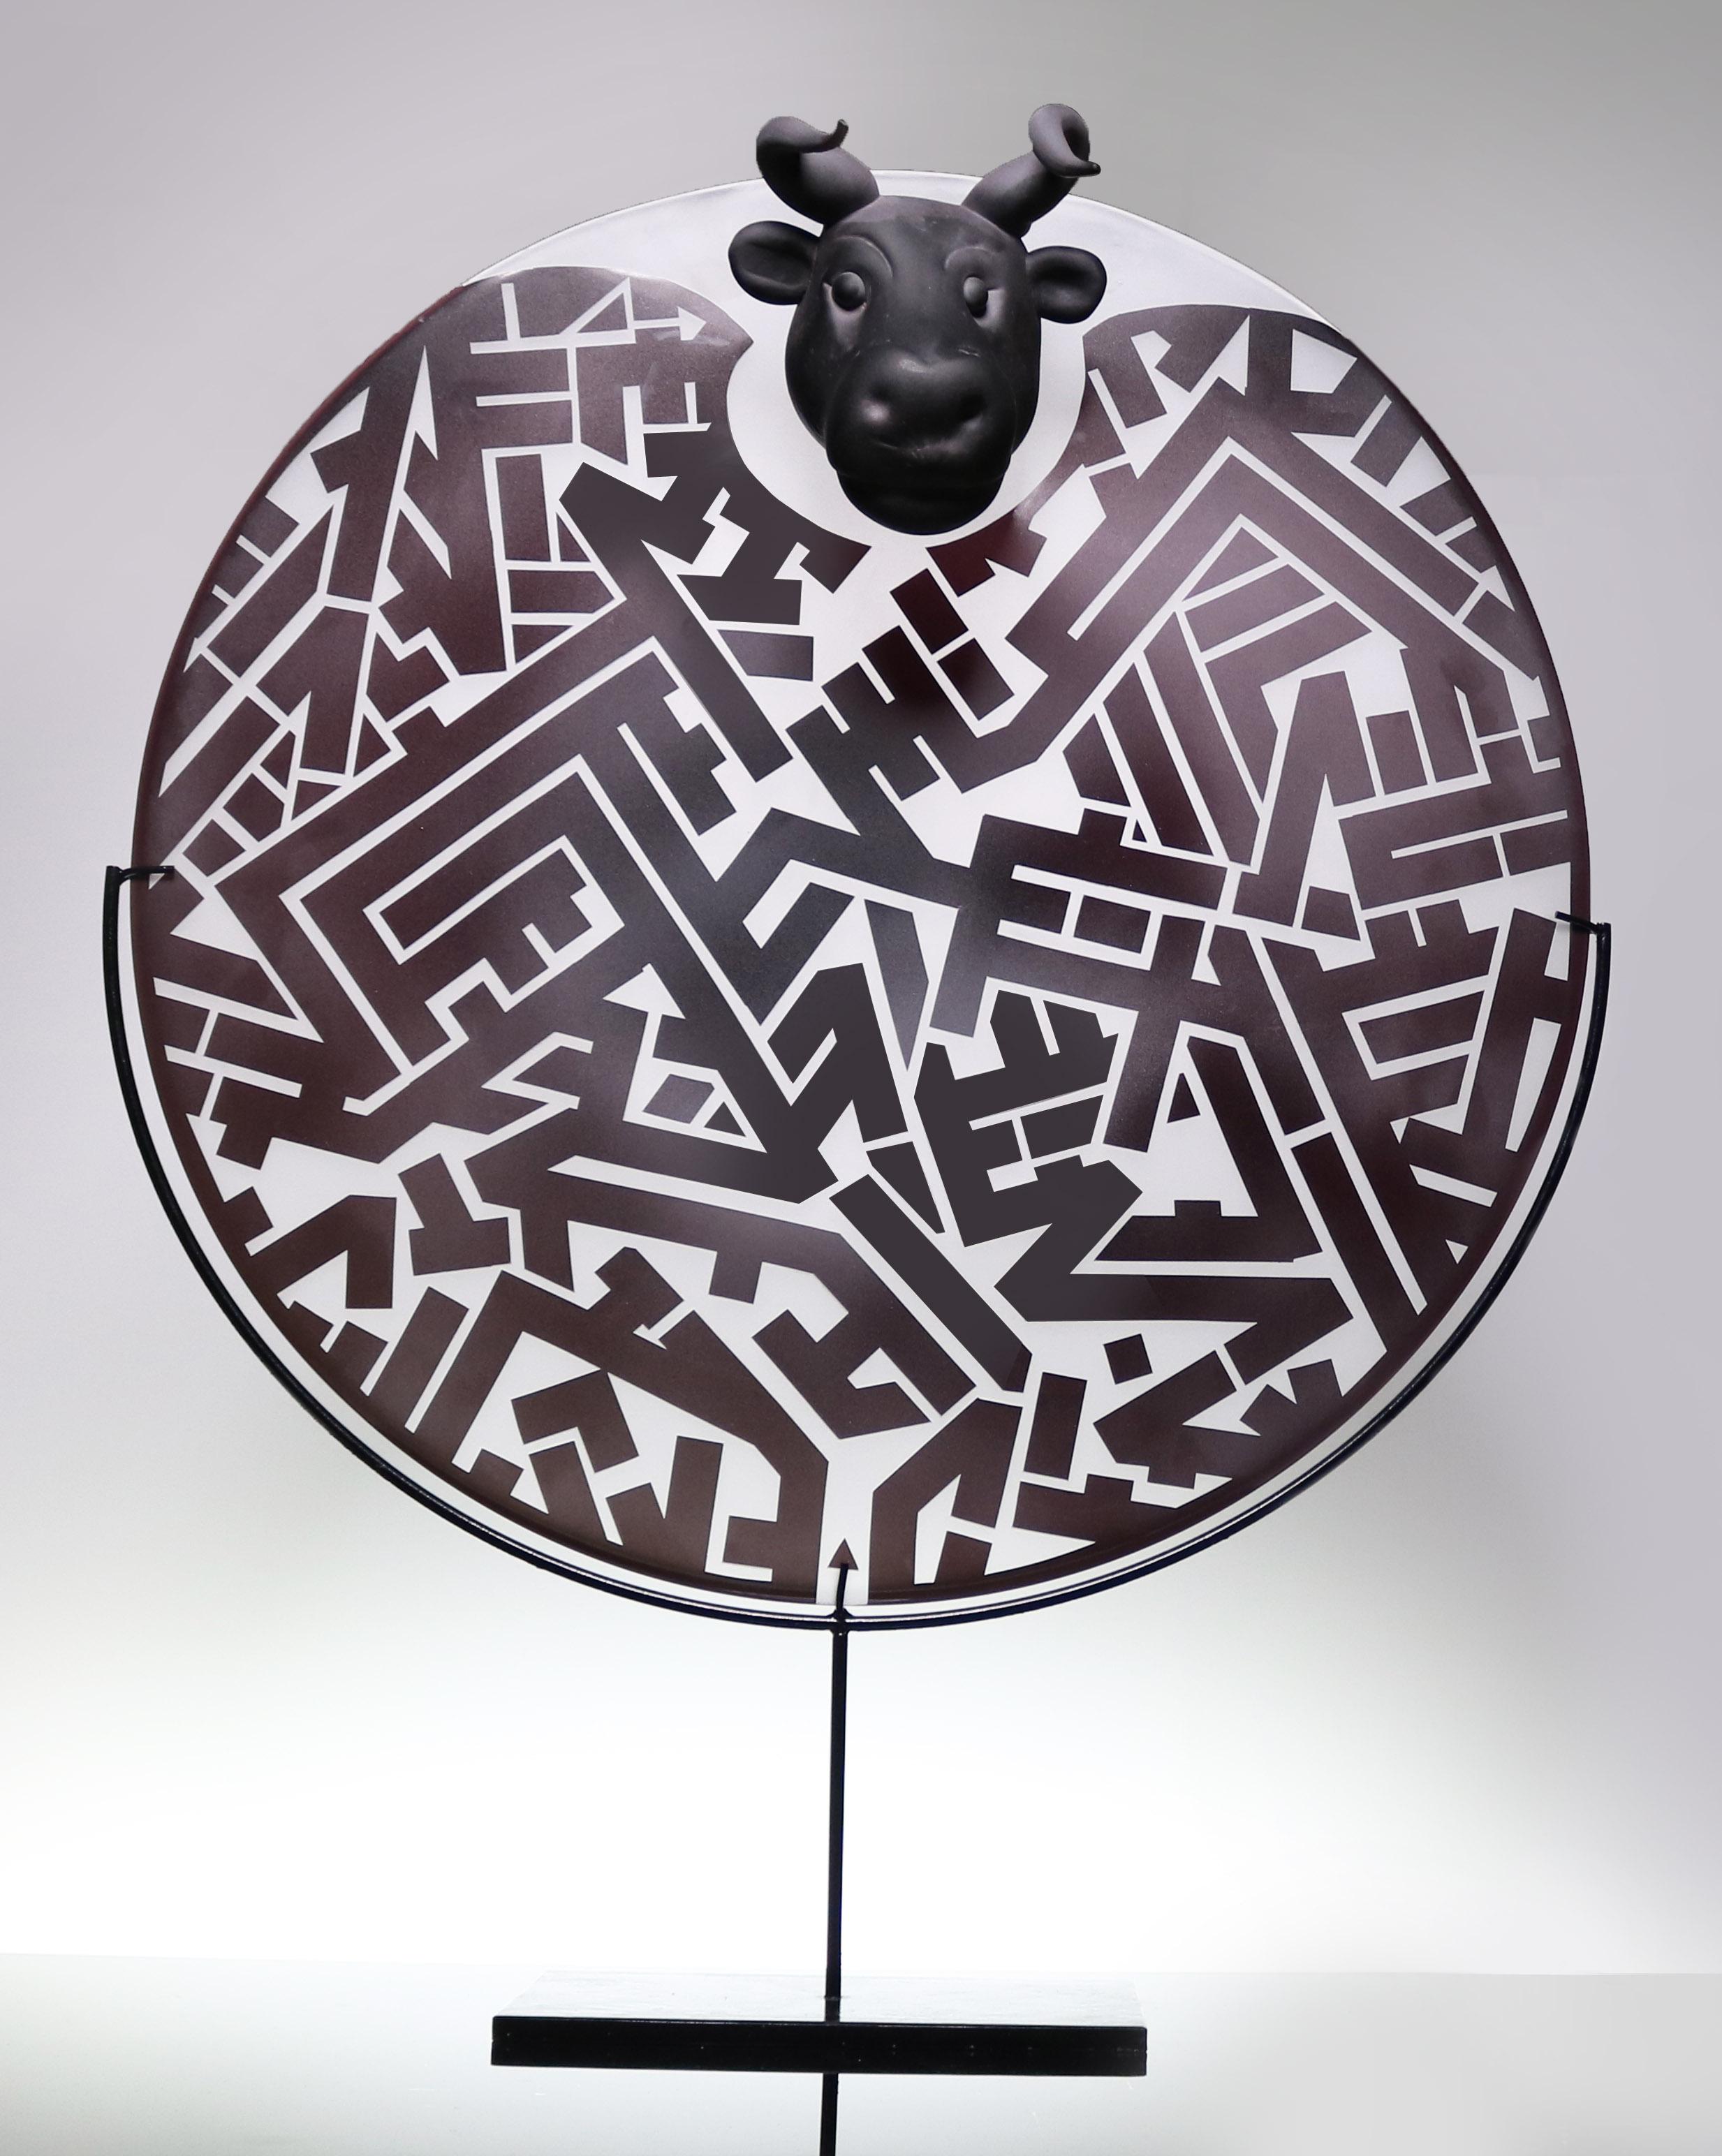 Theseus Maze